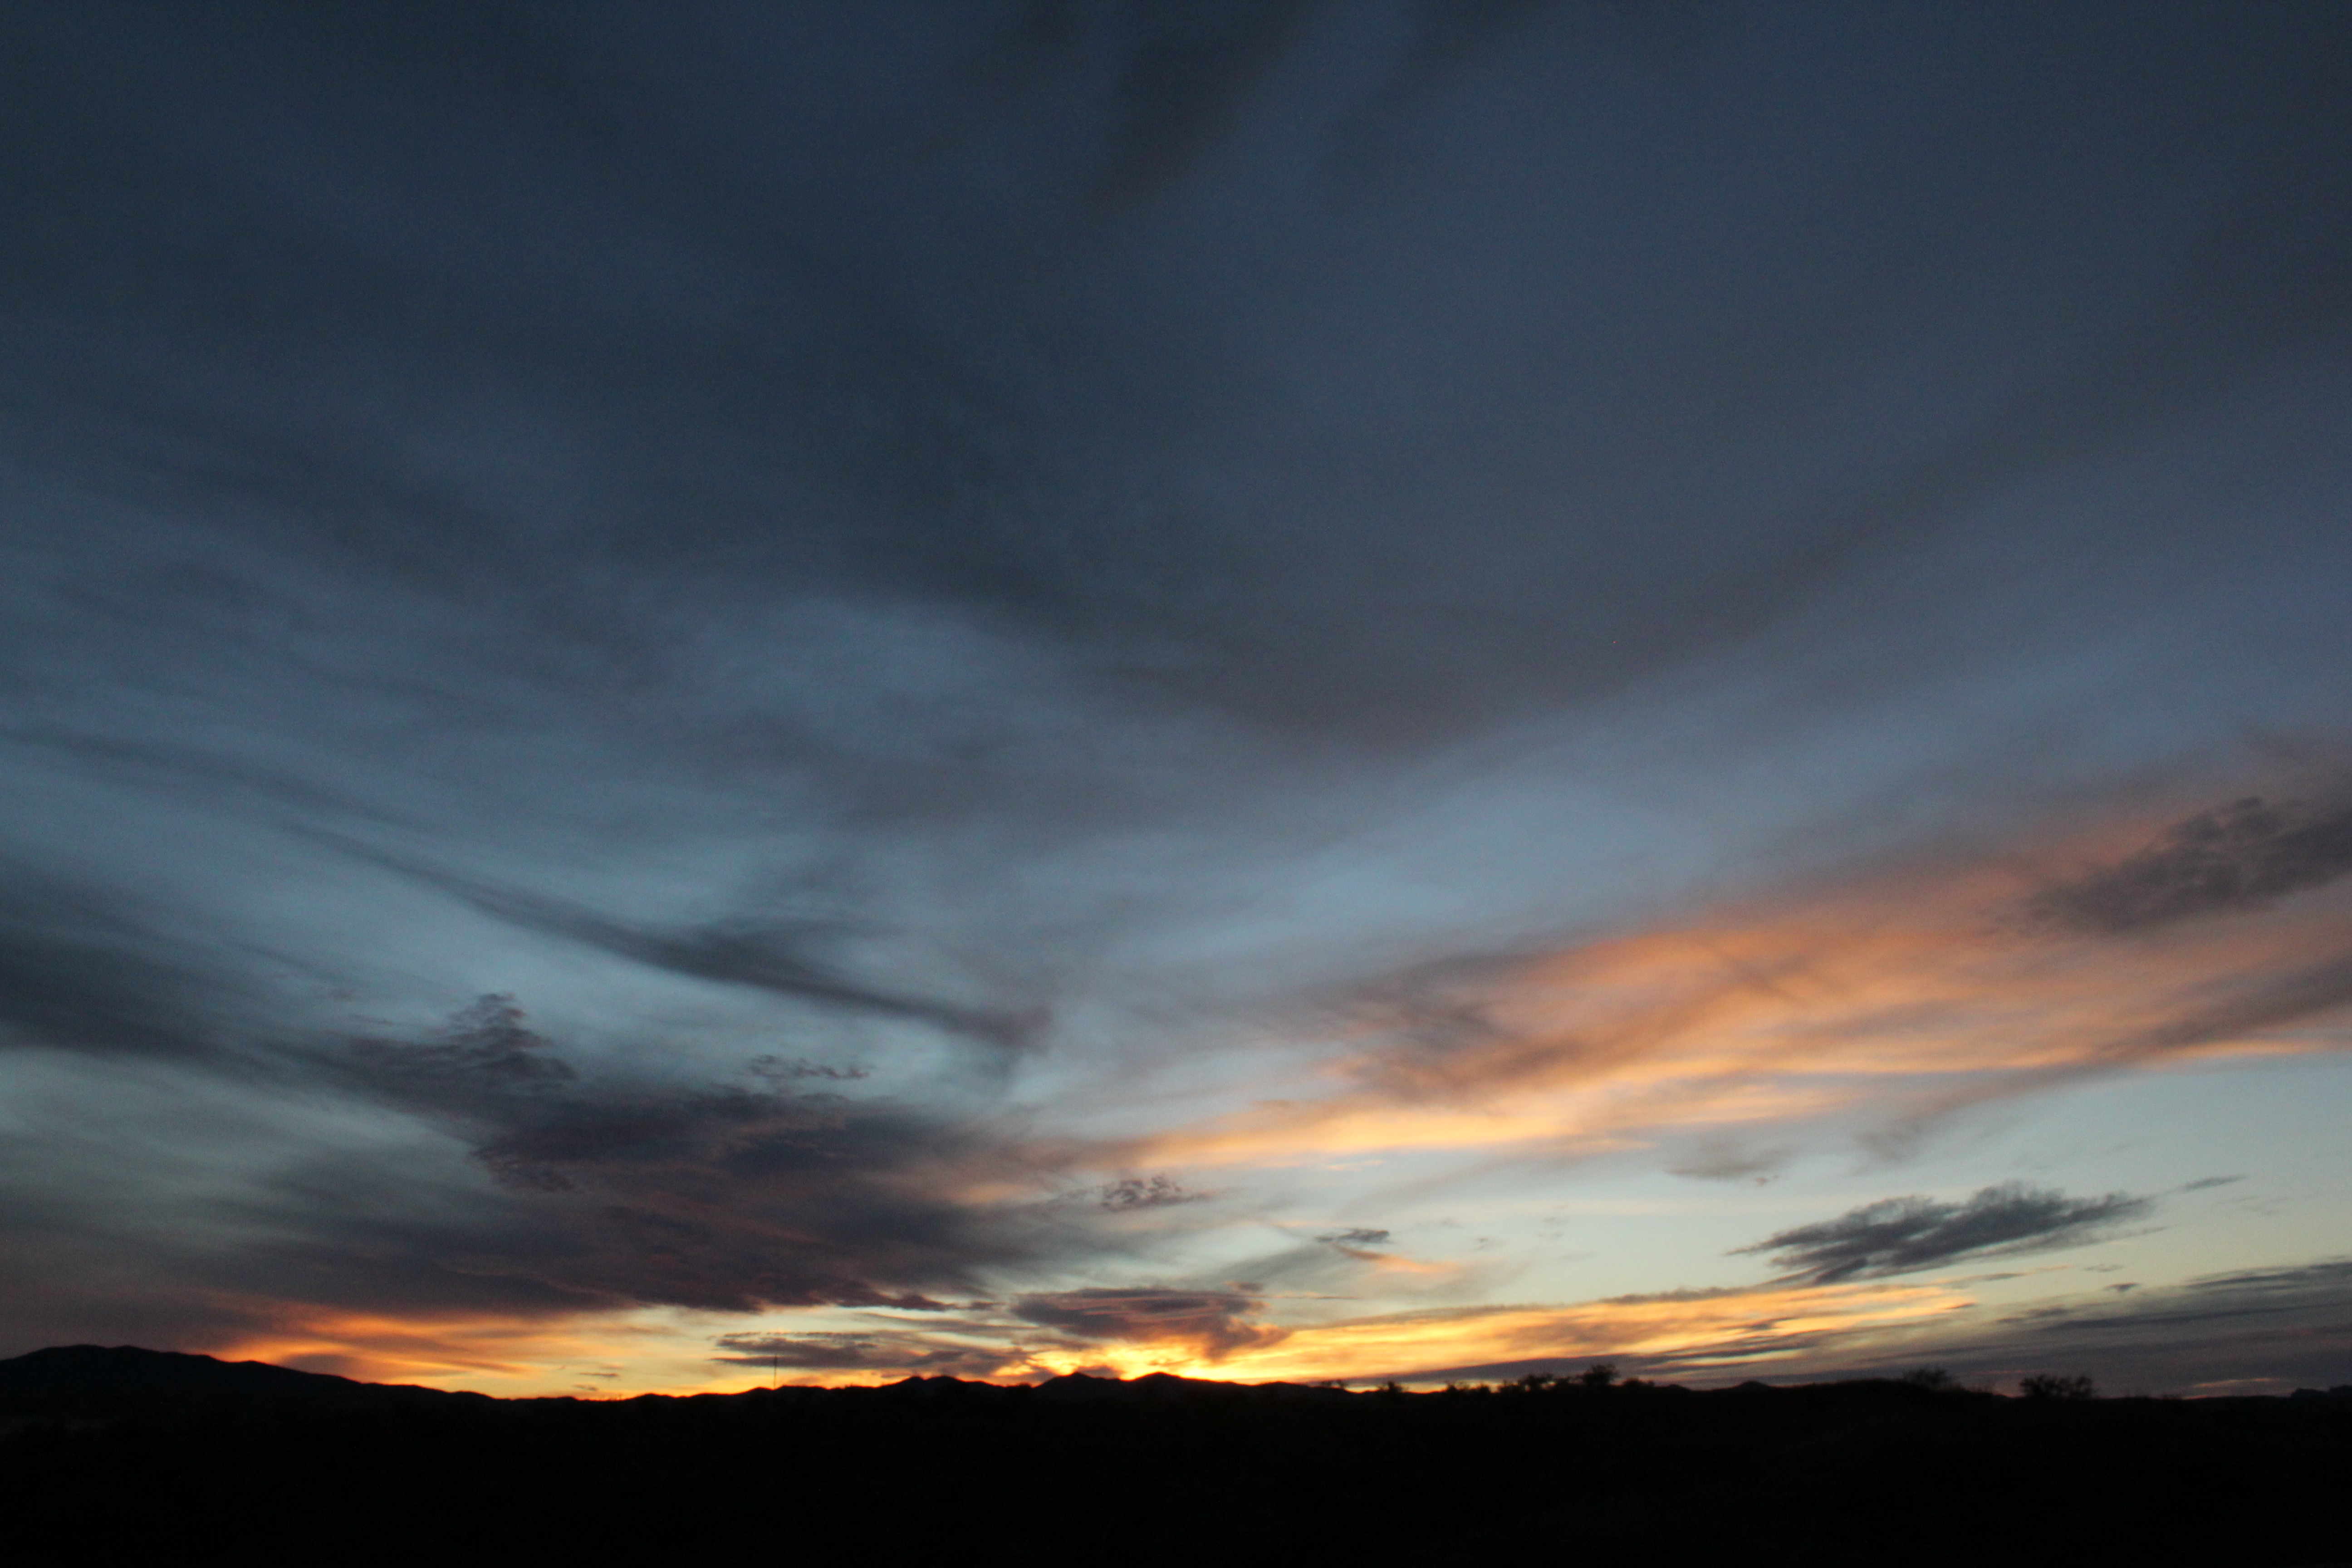 november light sunset wild arizona cactus sky mountains southwest nature  clouds outdoors evening colorful shadows desert